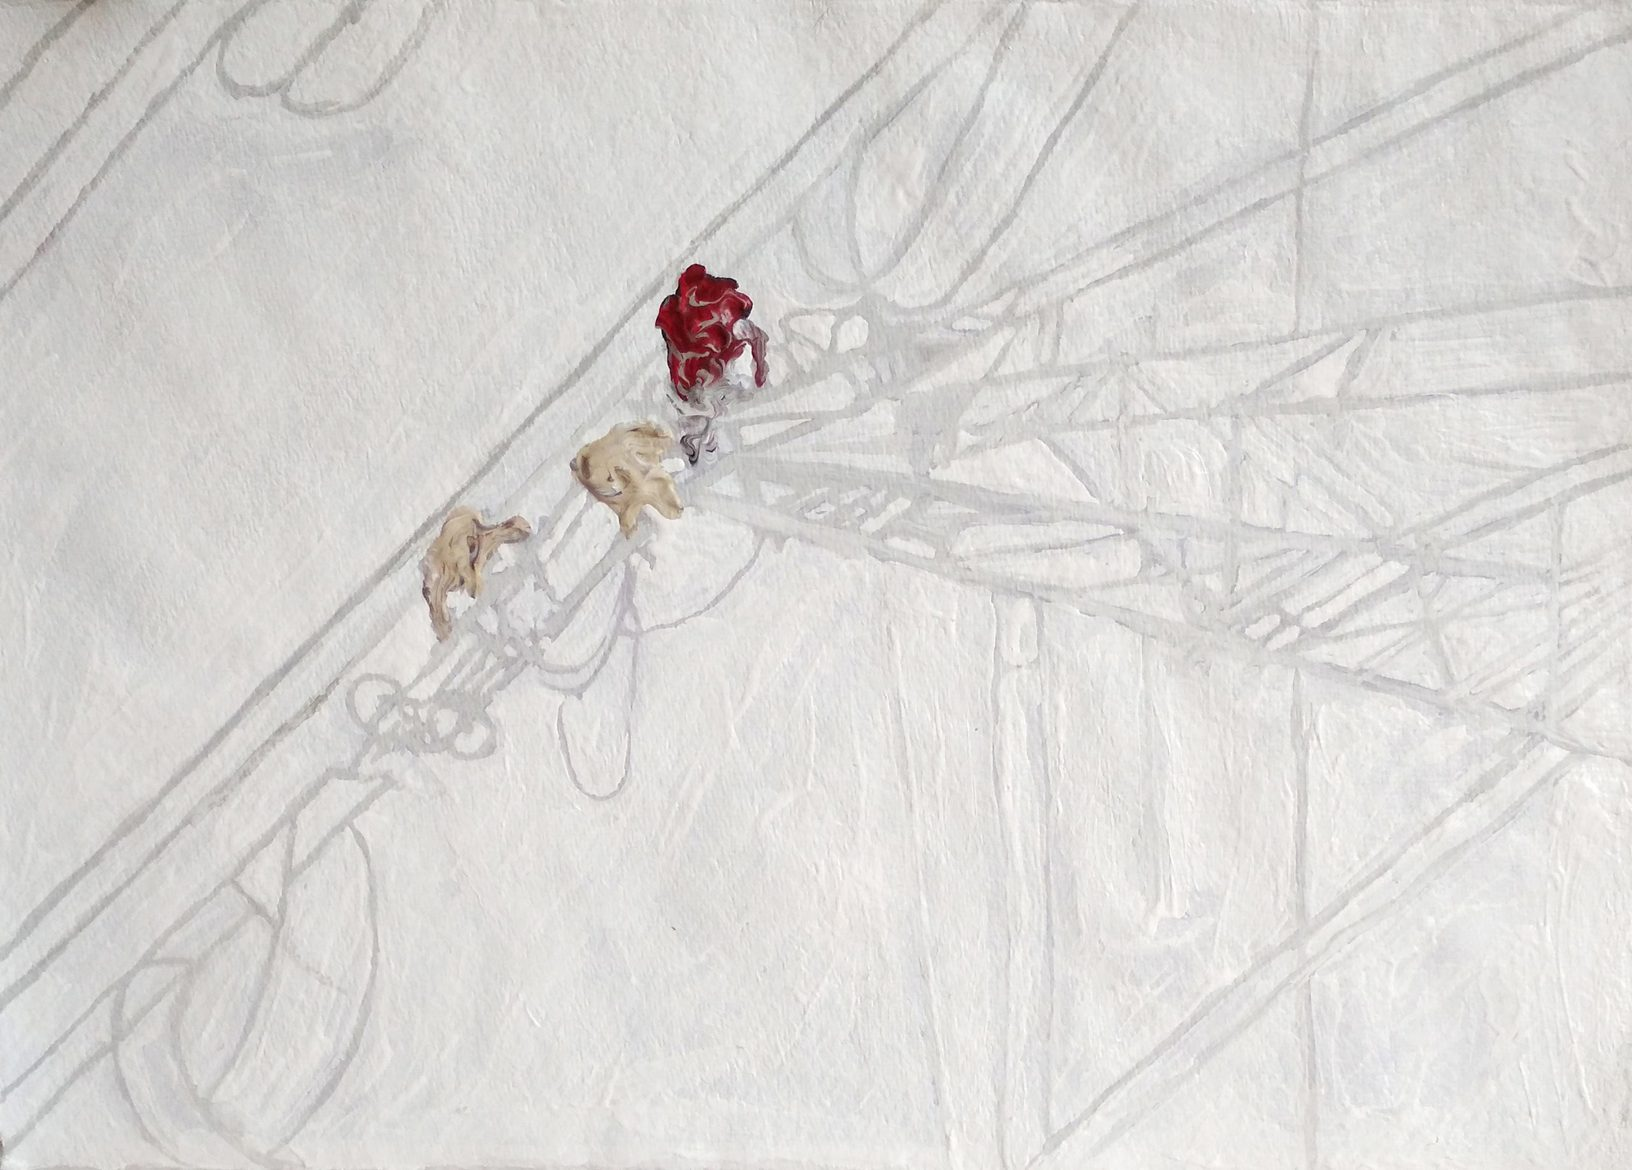 Clemens Krauss 'Vertigo Proposal' (From the series '2017-2021'), 2020, acrylic on hand-made paper, framed, 26 x 37 cm